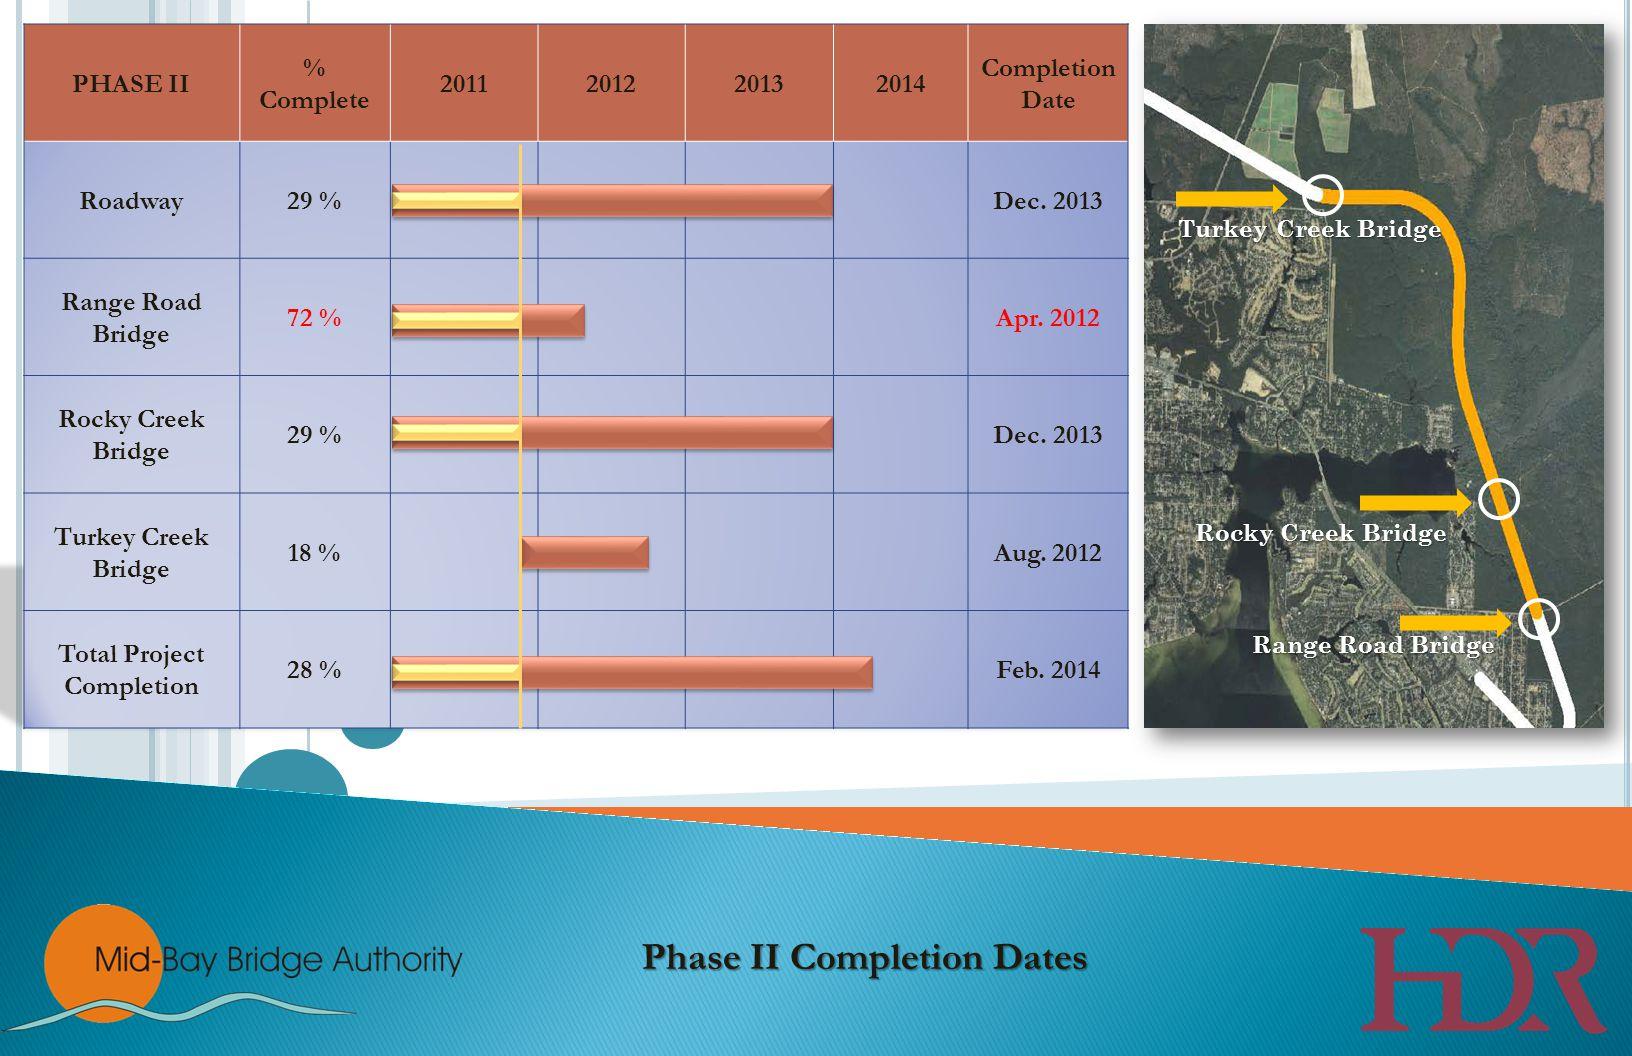 Turkey Creek Bridge Rocky Creek Bridge Range Road Bridge Phase II Completion Dates